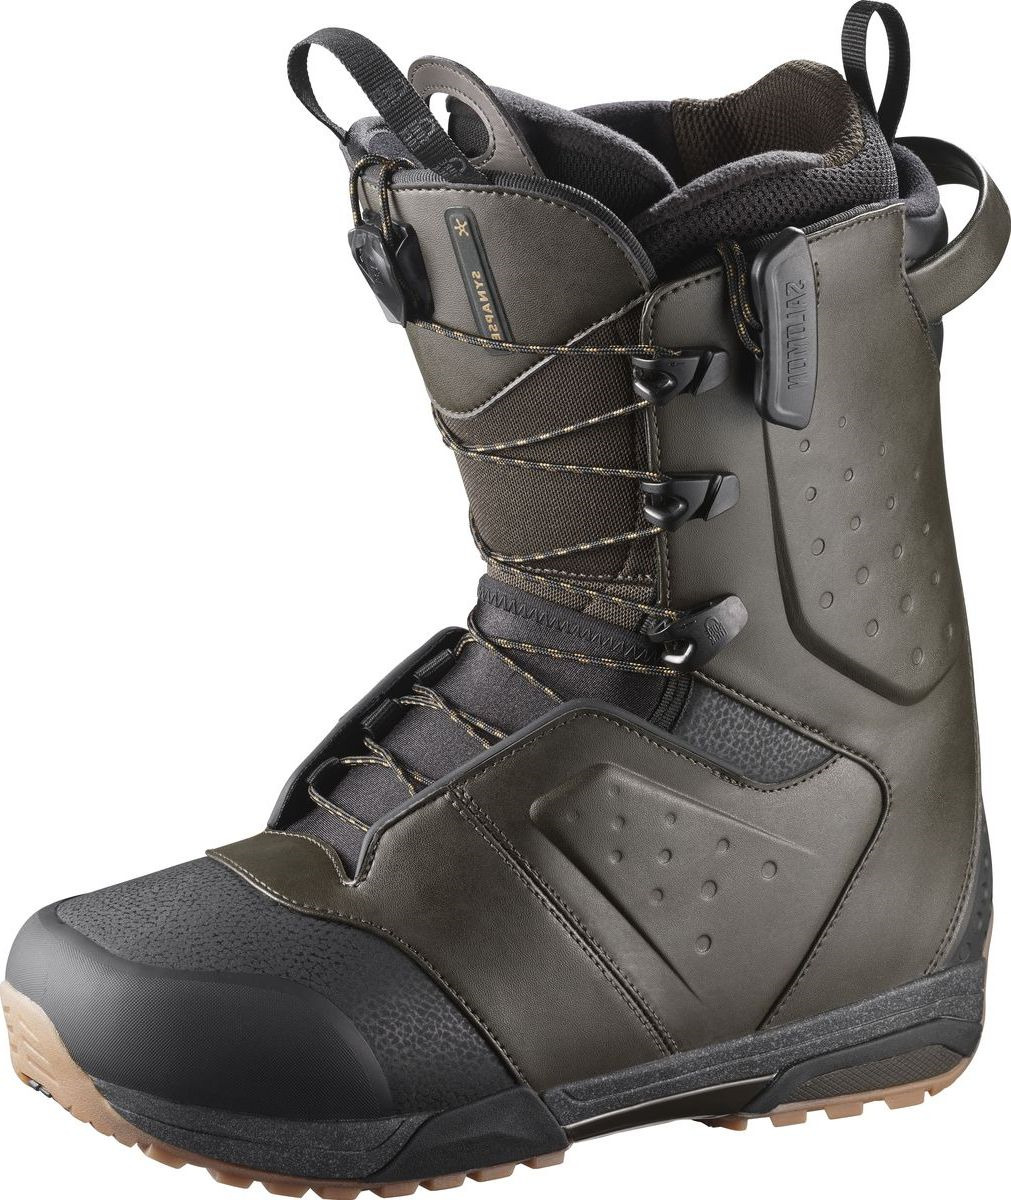 "Ботинки для сноуборда Salomon ""Synapse"", цвет: темно-зеленый. Размер 29 (44)"